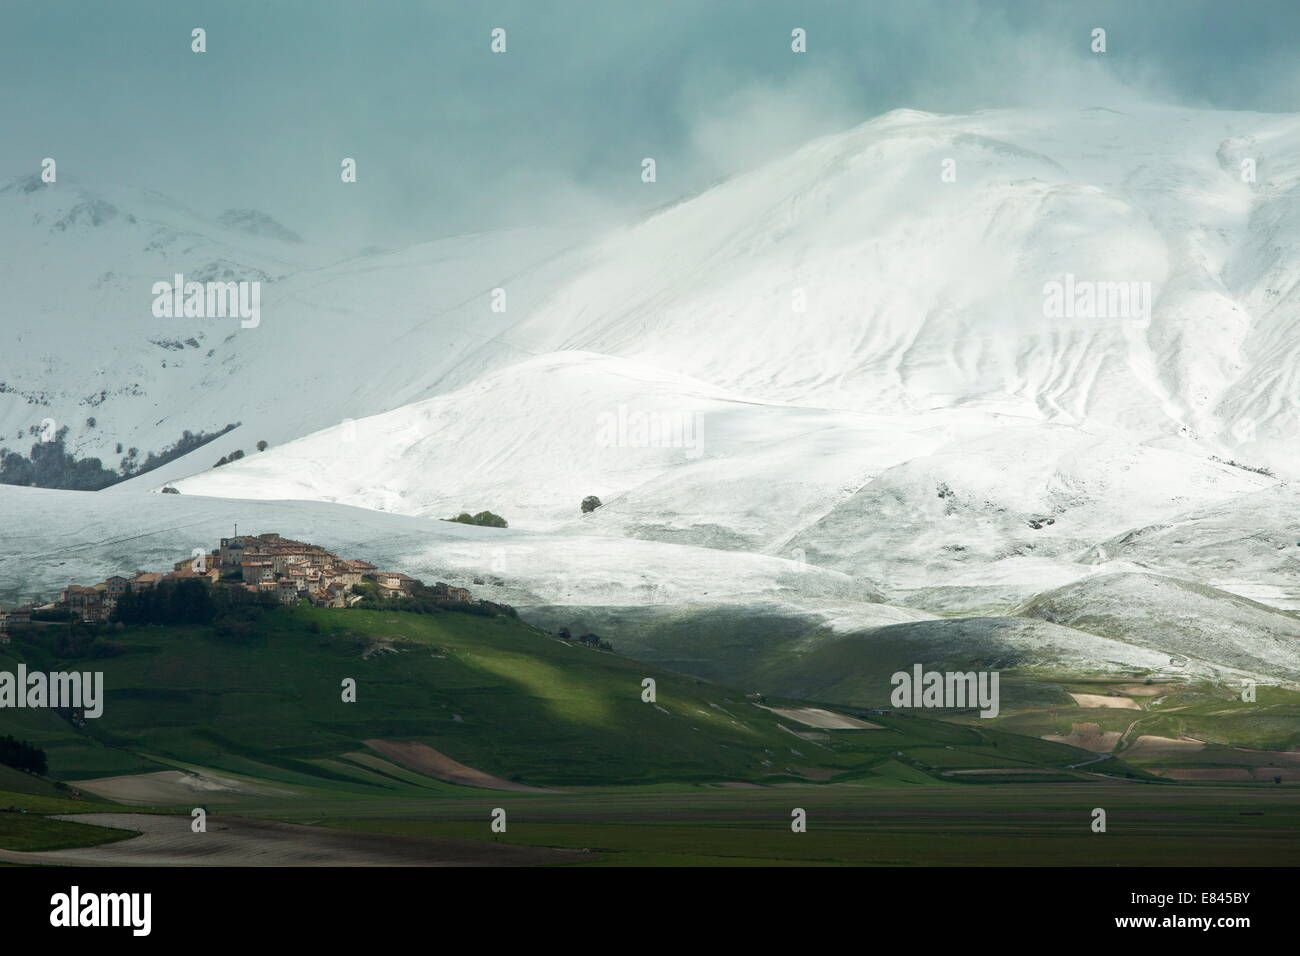 Castelluccio di Norcia and the Piano Grande in late spring, with snowy mountains; Monti Sibillini National Park, - Stock Image